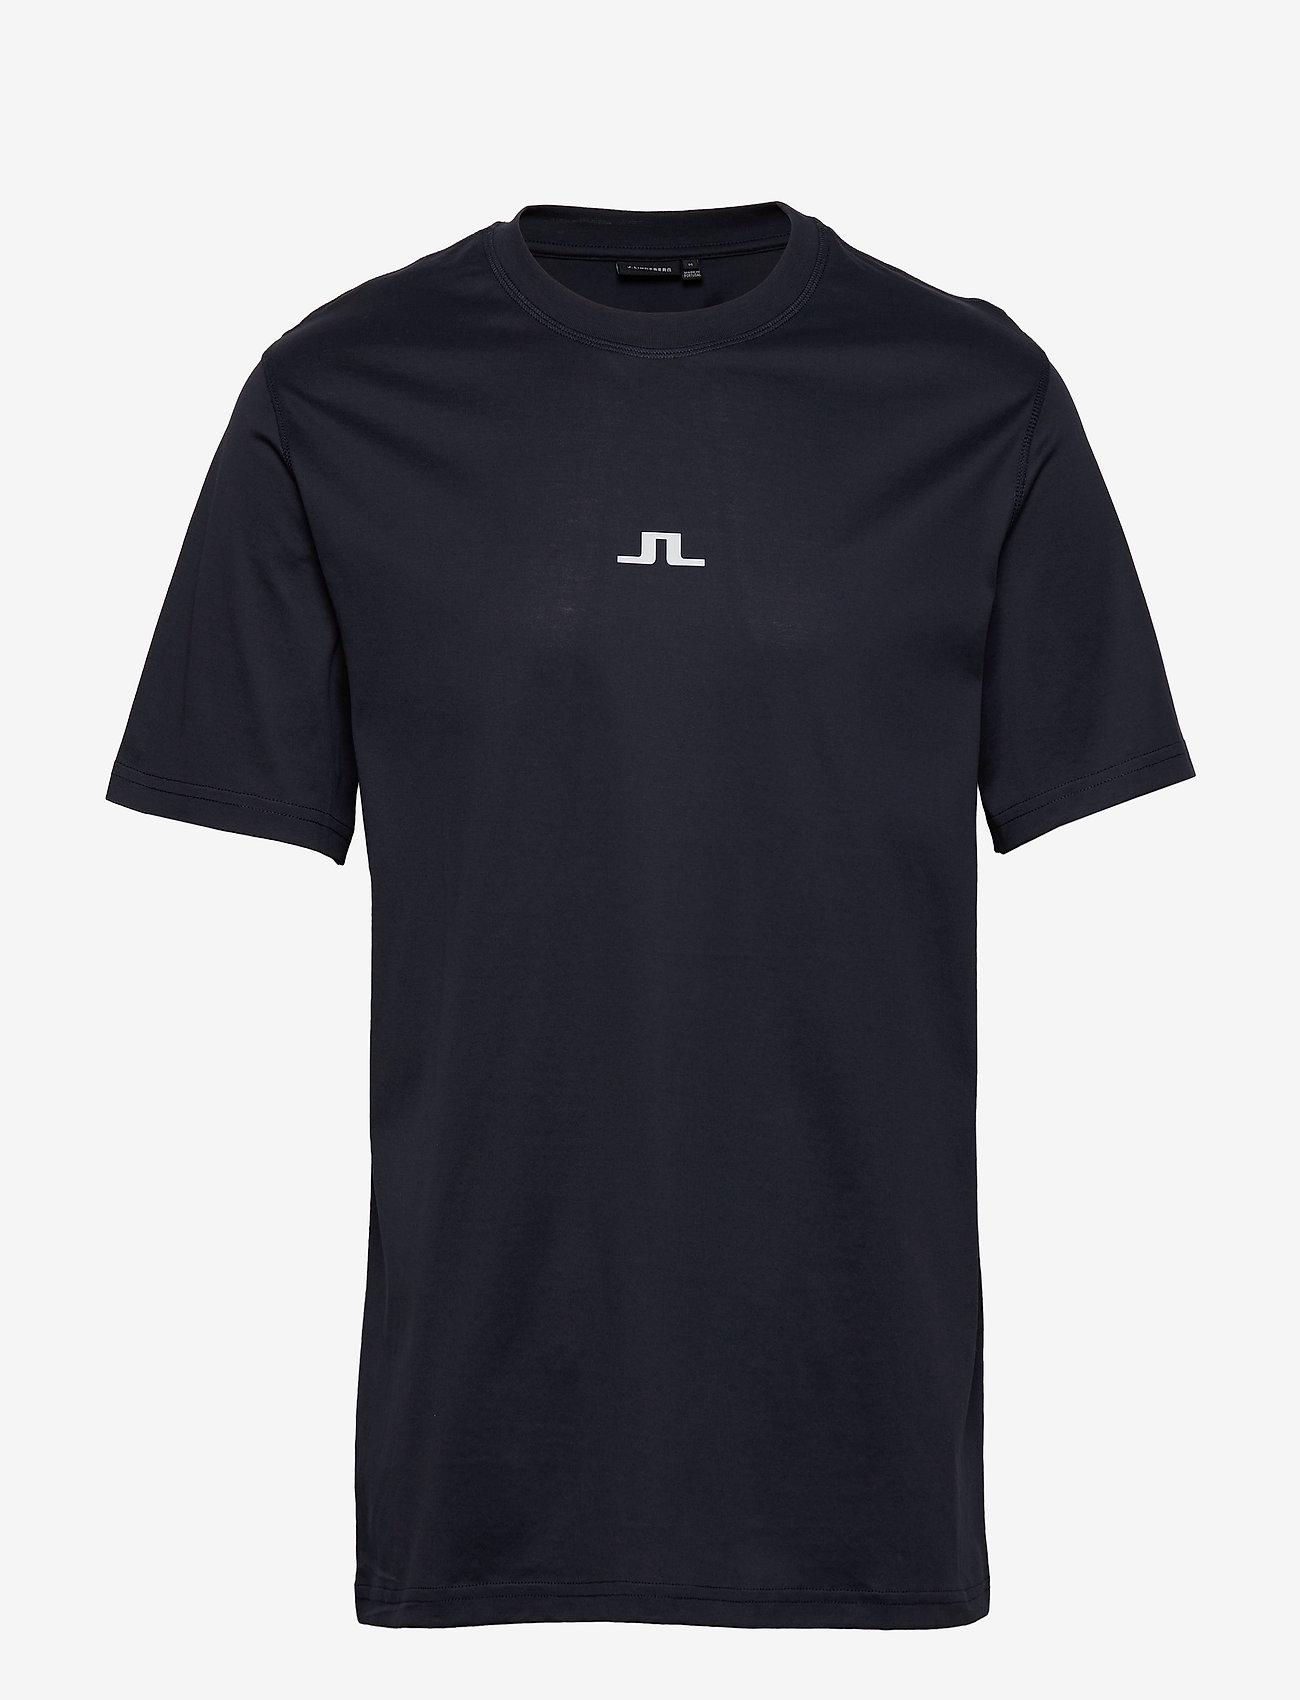 J. Lindeberg - Jordan Bridge t-shirt cotton - basic t-shirts - jl navy - 0